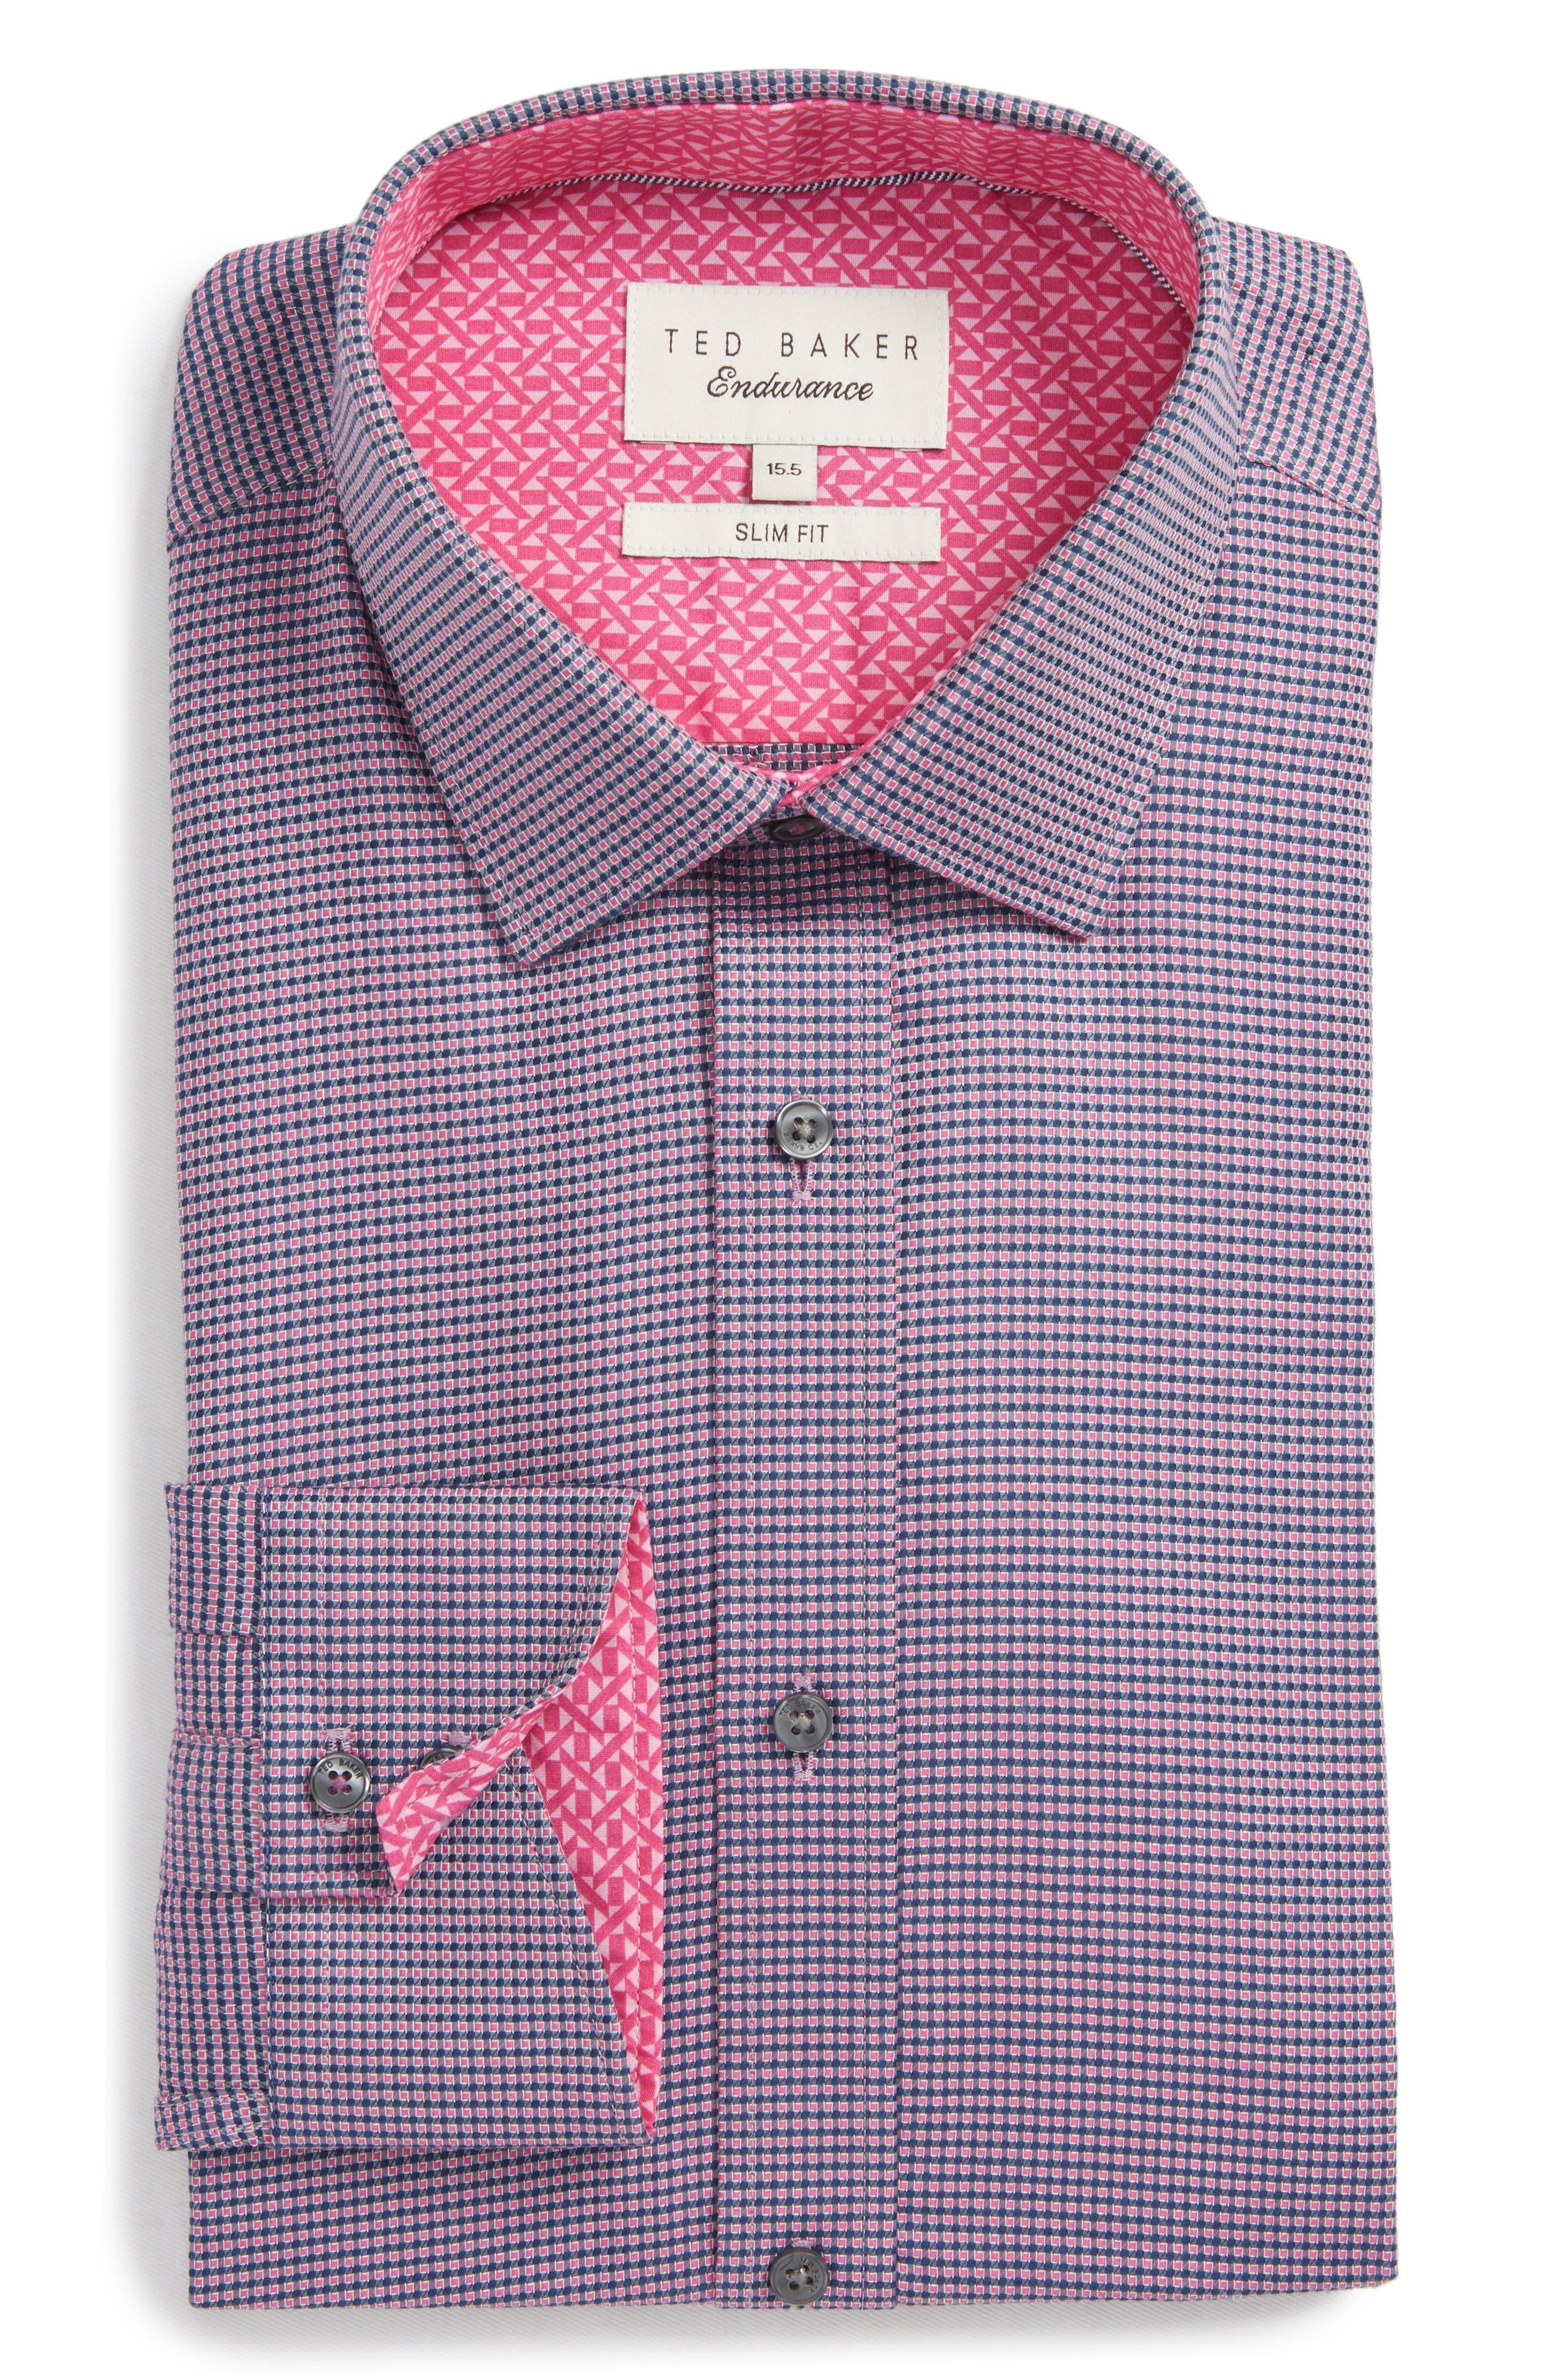 Endurance Slim Fit Box Twill Dress Shirt,                         Main,                         color, PINK